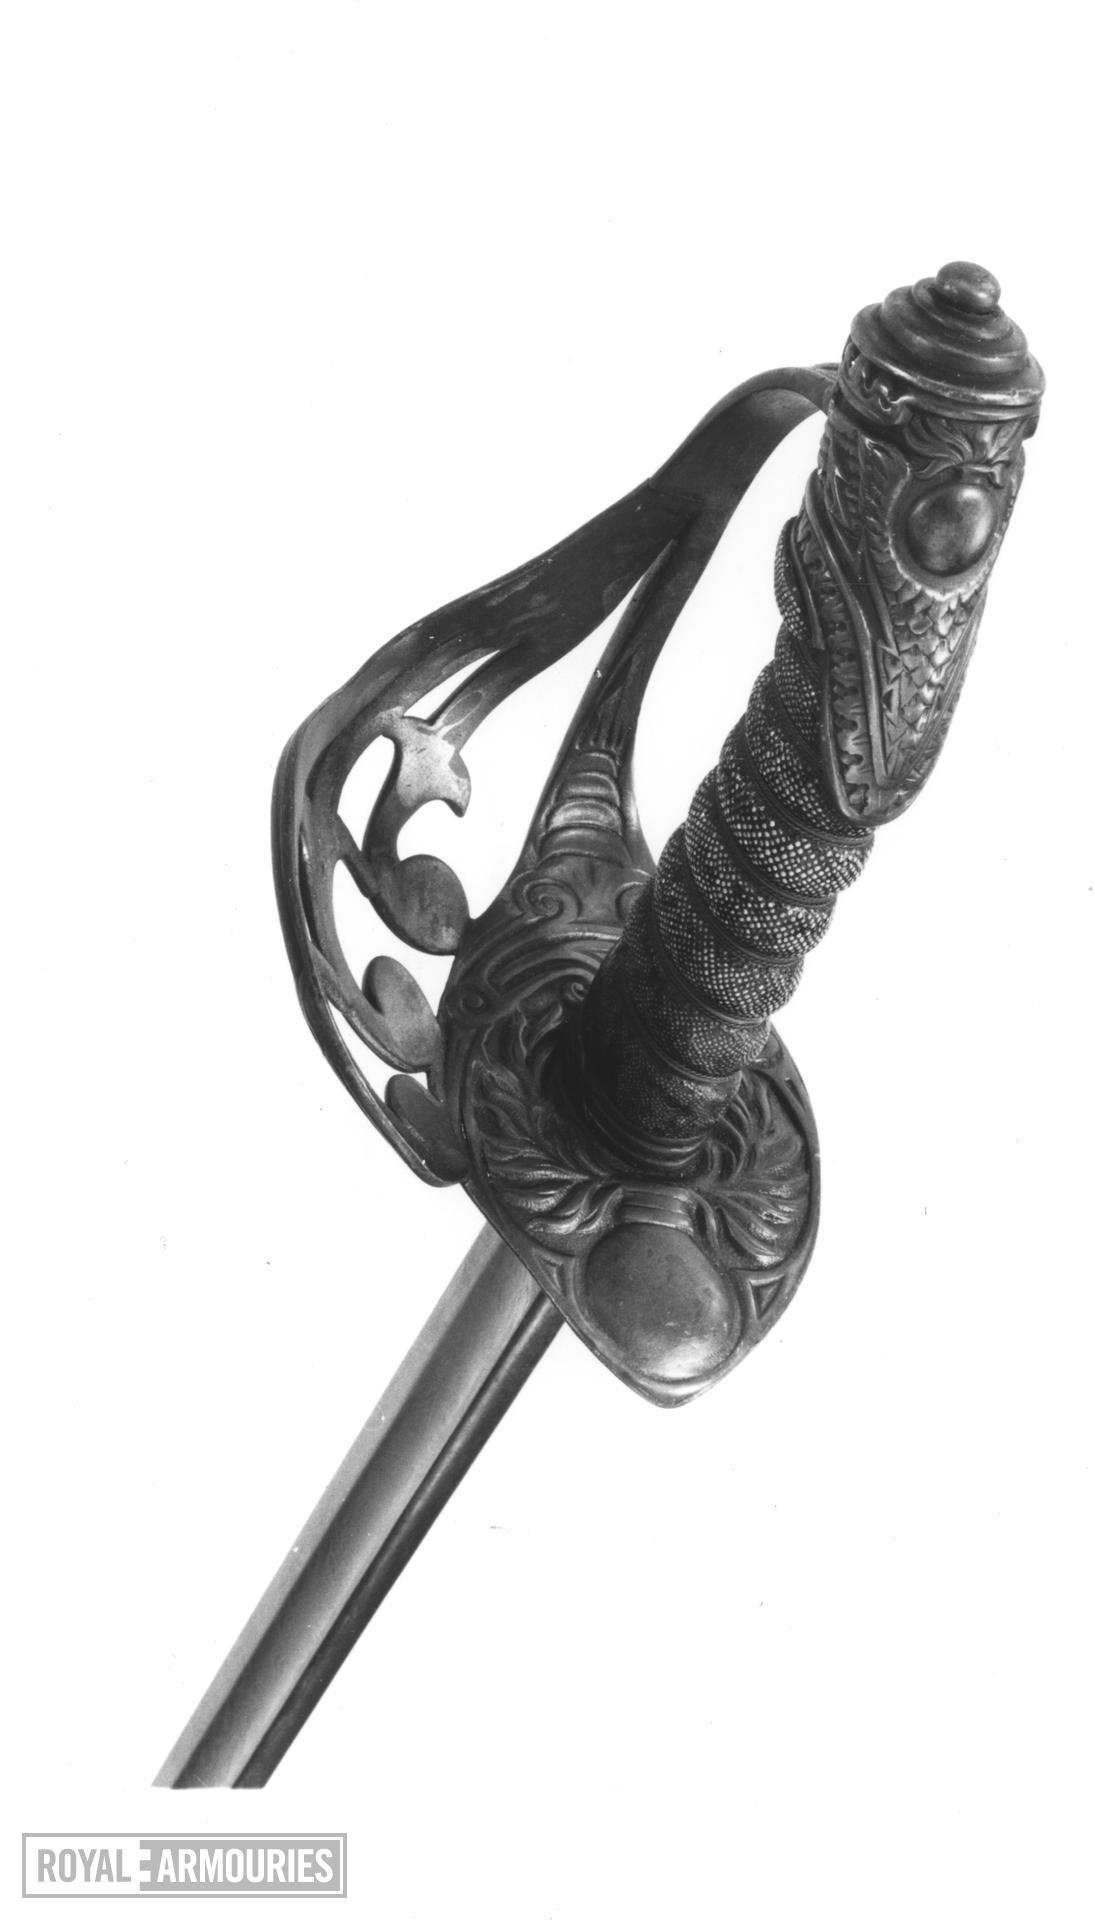 Sword Officer's dress sword, 2nd Life Guards, Pattern 1834.